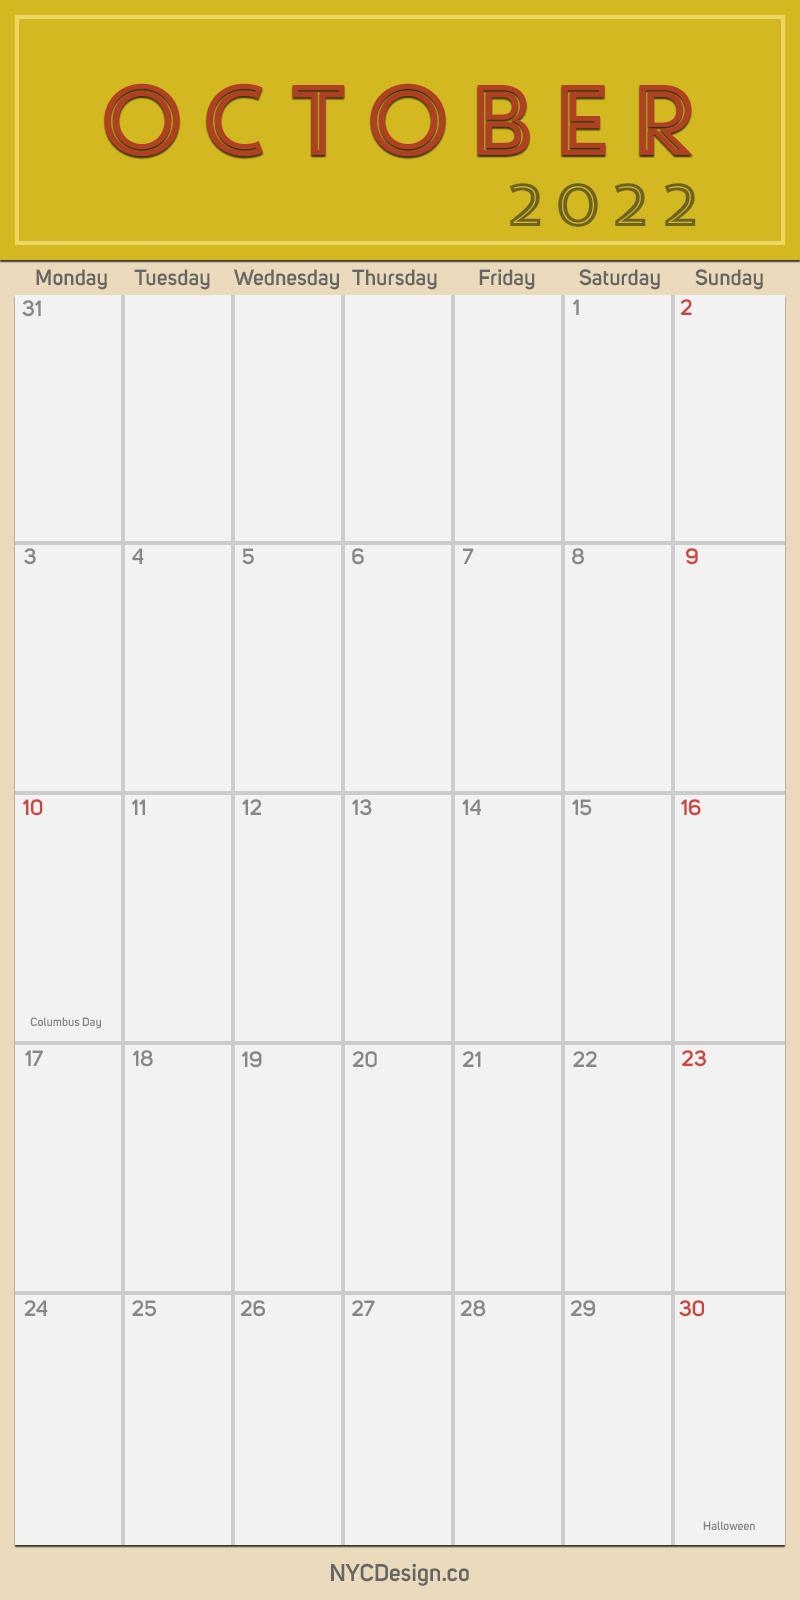 2022 October - Monthly Calendar, Planner, Printable Free ...